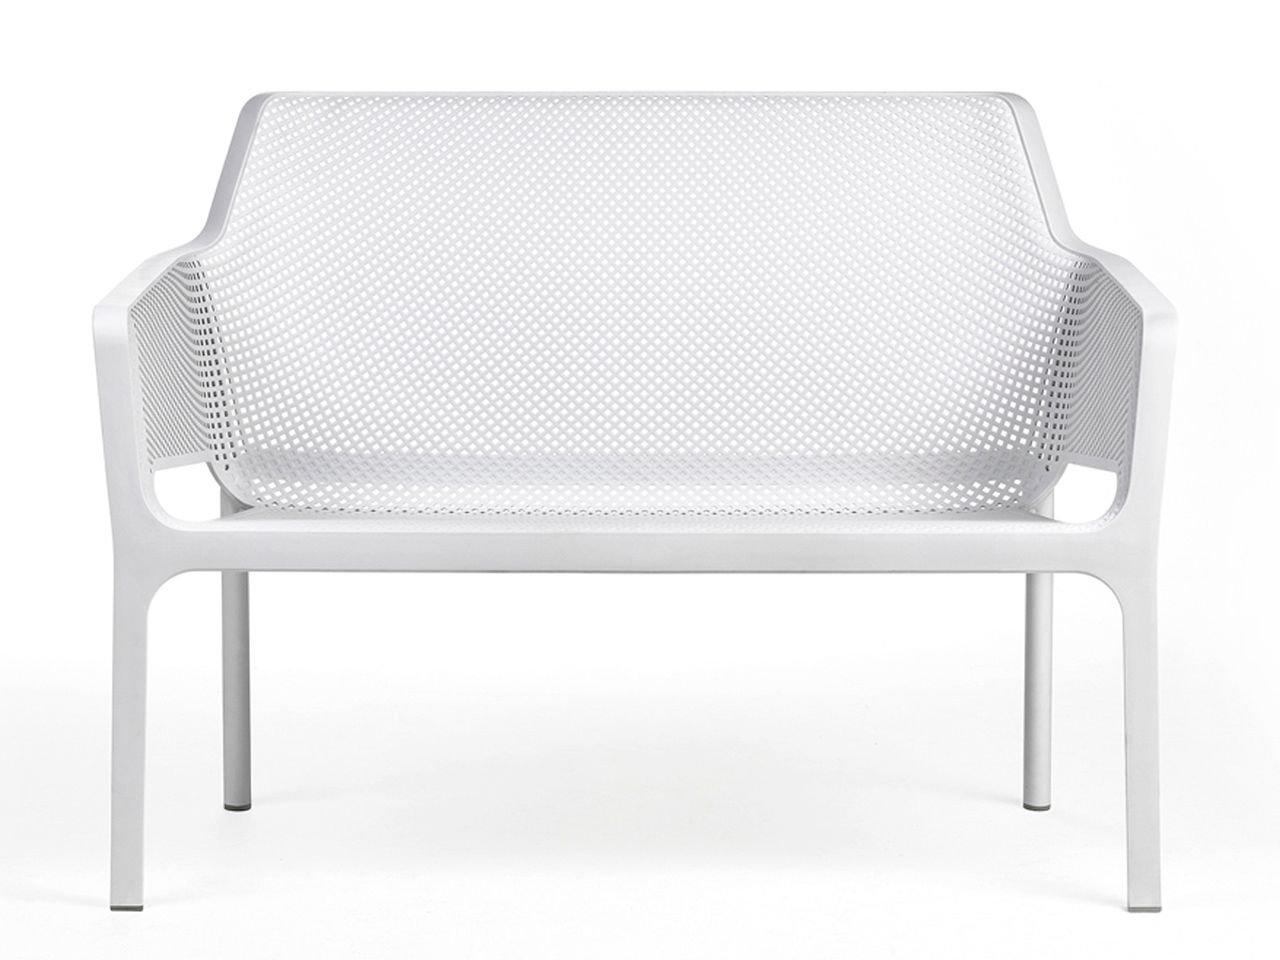 Panchina Net Bench - v5